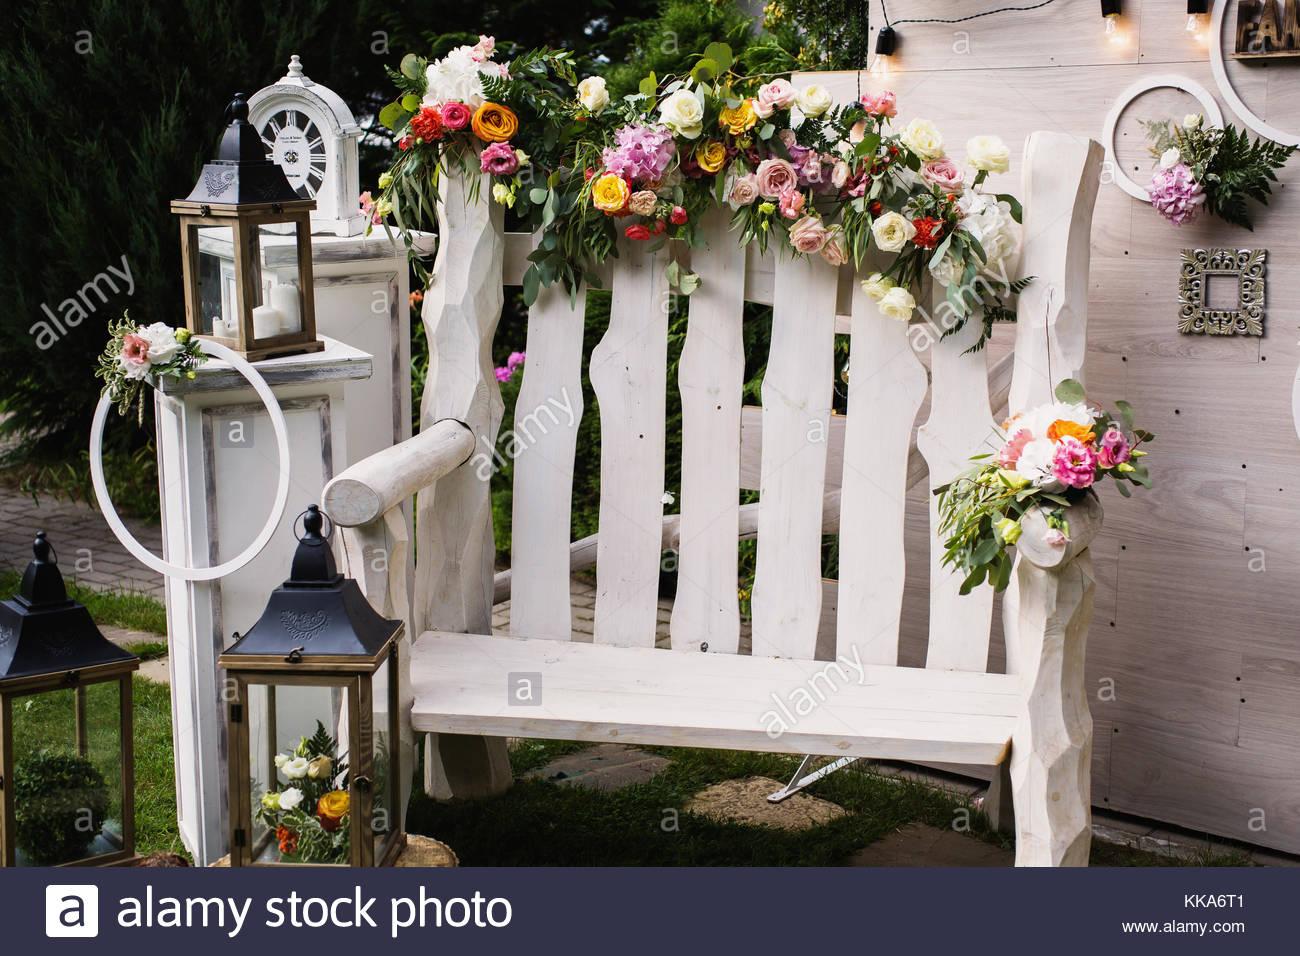 Beautiful unusual wedding decor rustic style bench wall of stock beautiful unusual wedding decor rustic style bench wall of flowers lanterns at the photo zone junglespirit Choice Image